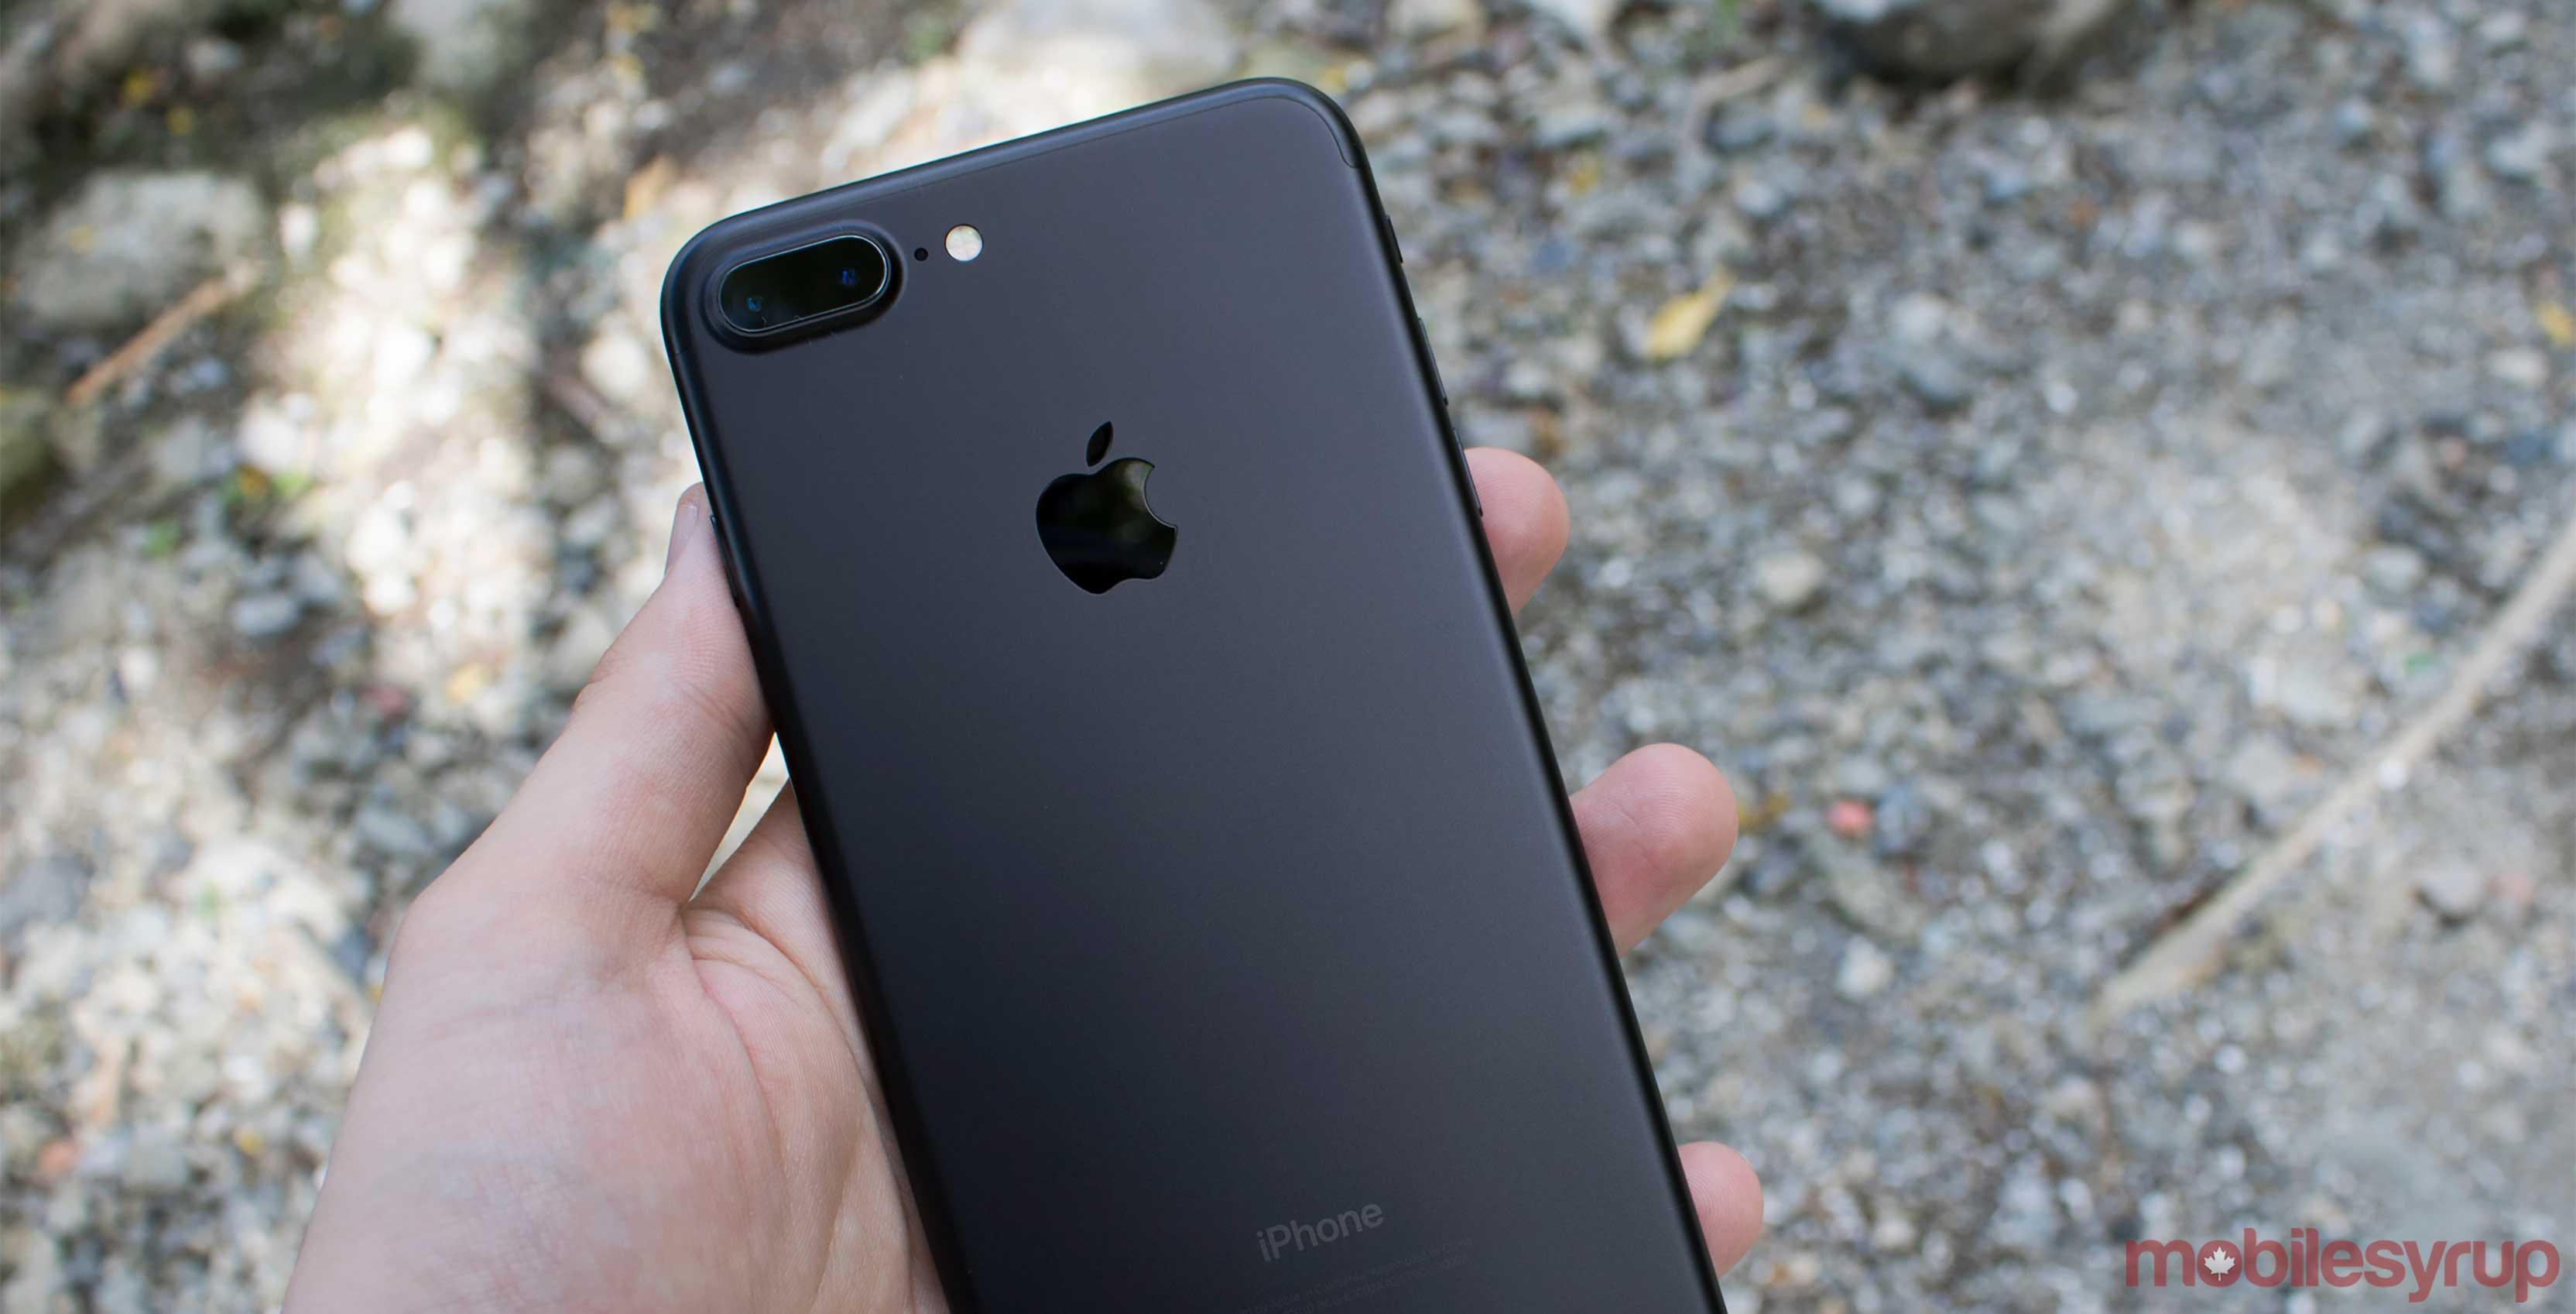 an iPhone 7 Plus smartphone